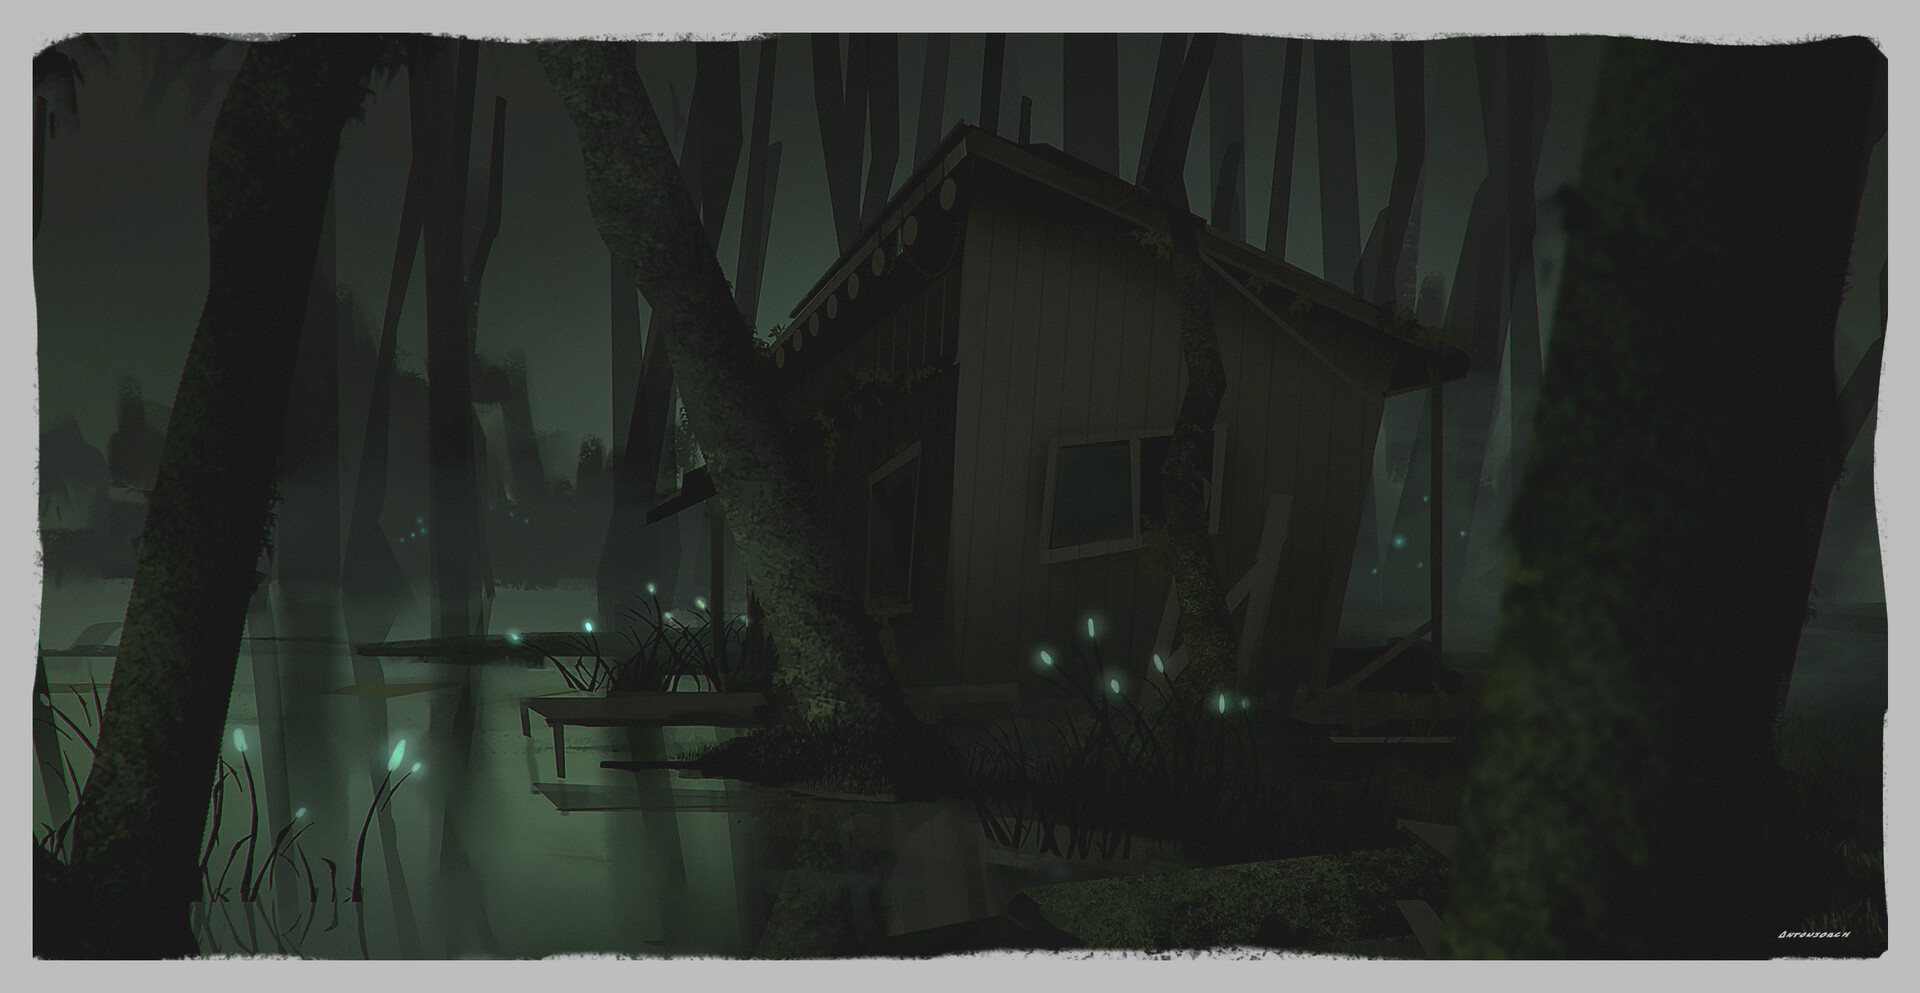 Jorge gonzalez swamp 0210209 2